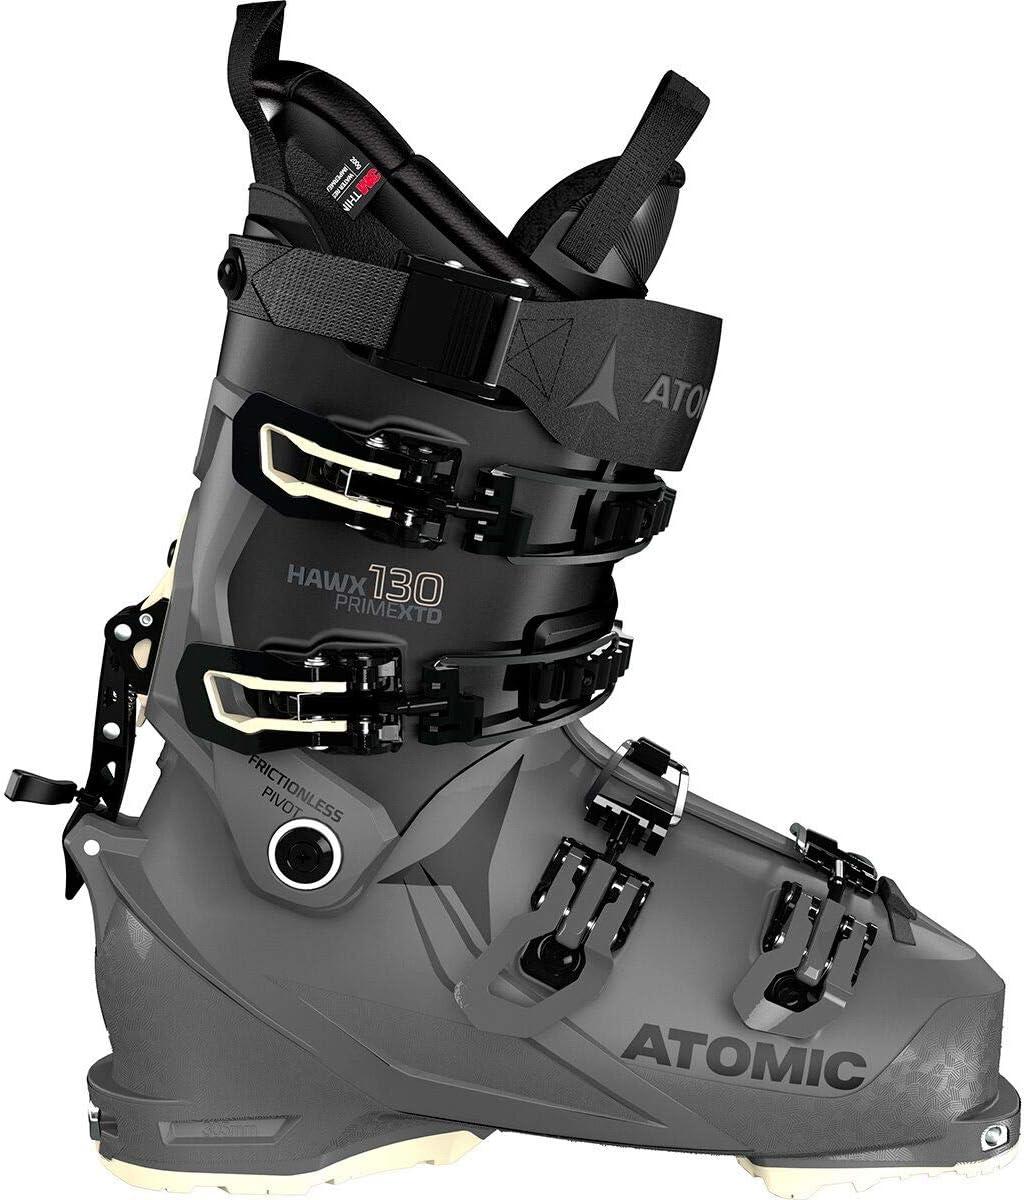 Atomic HAWX Prime XTD Bargain Ski shipfree Boots 130